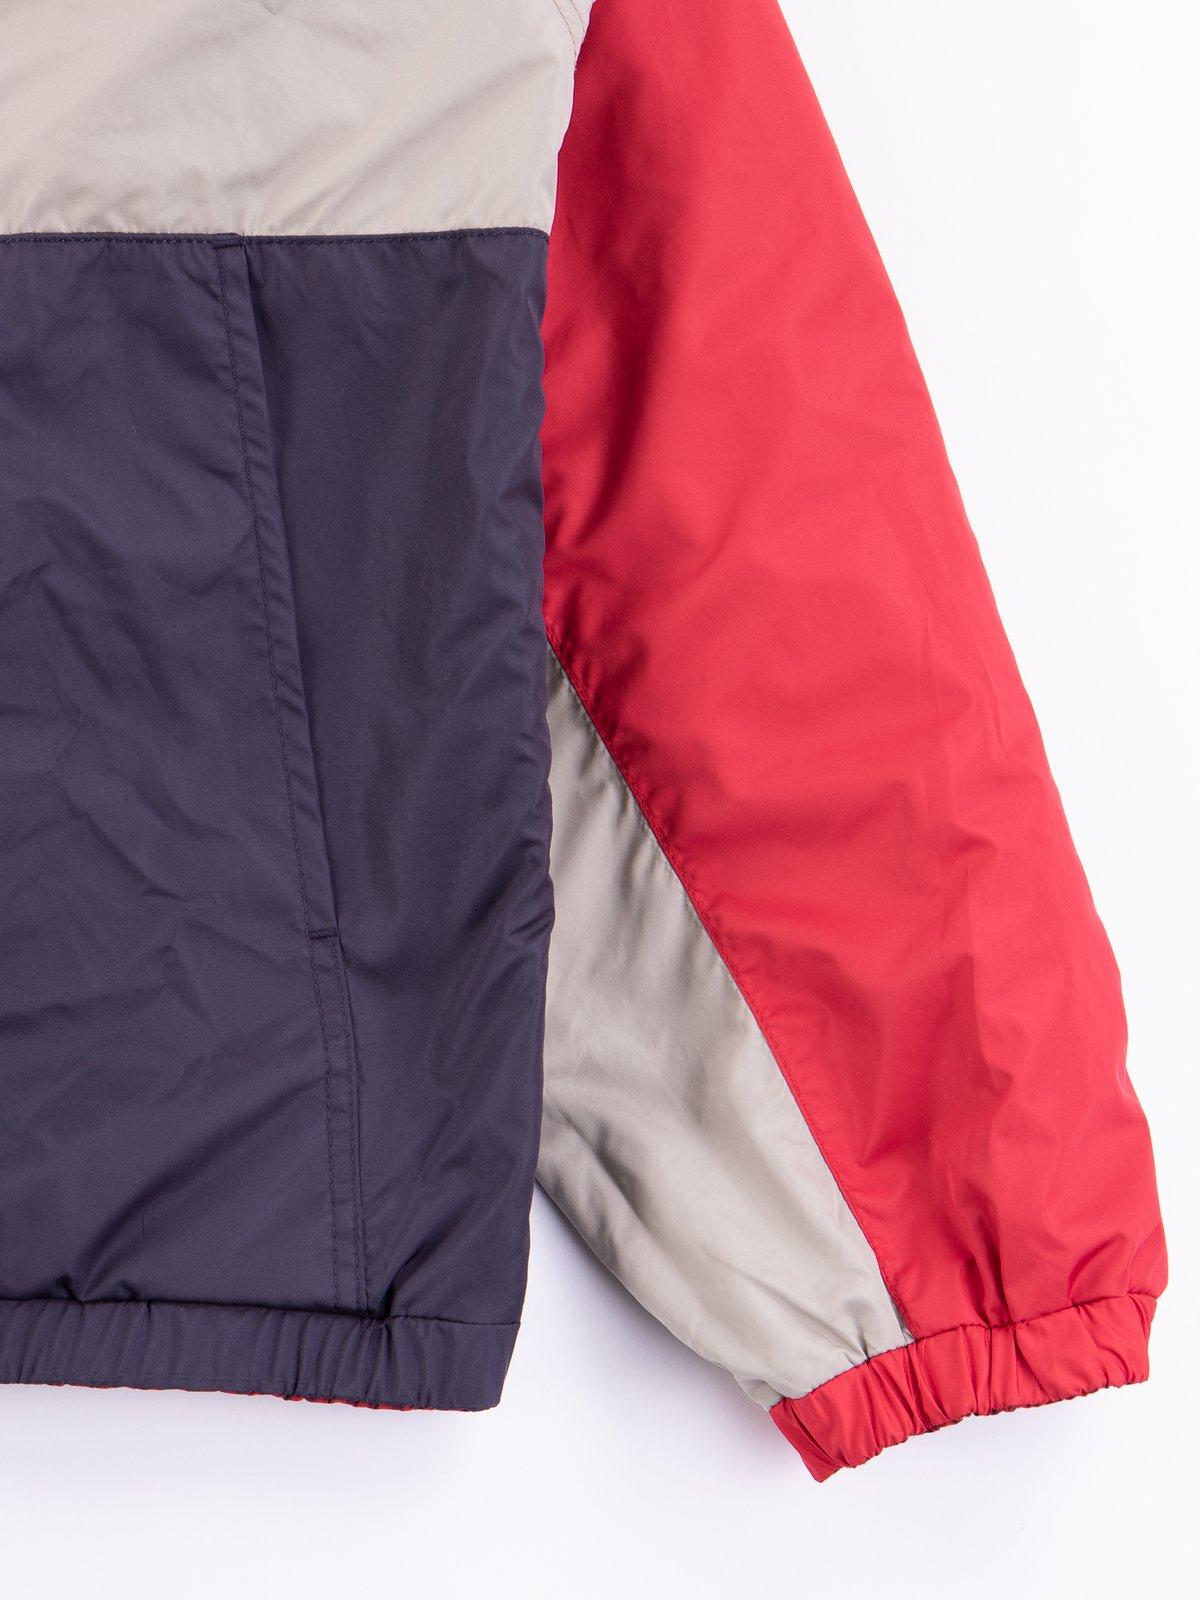 Red Gingham Reversible Jacket - Image 8